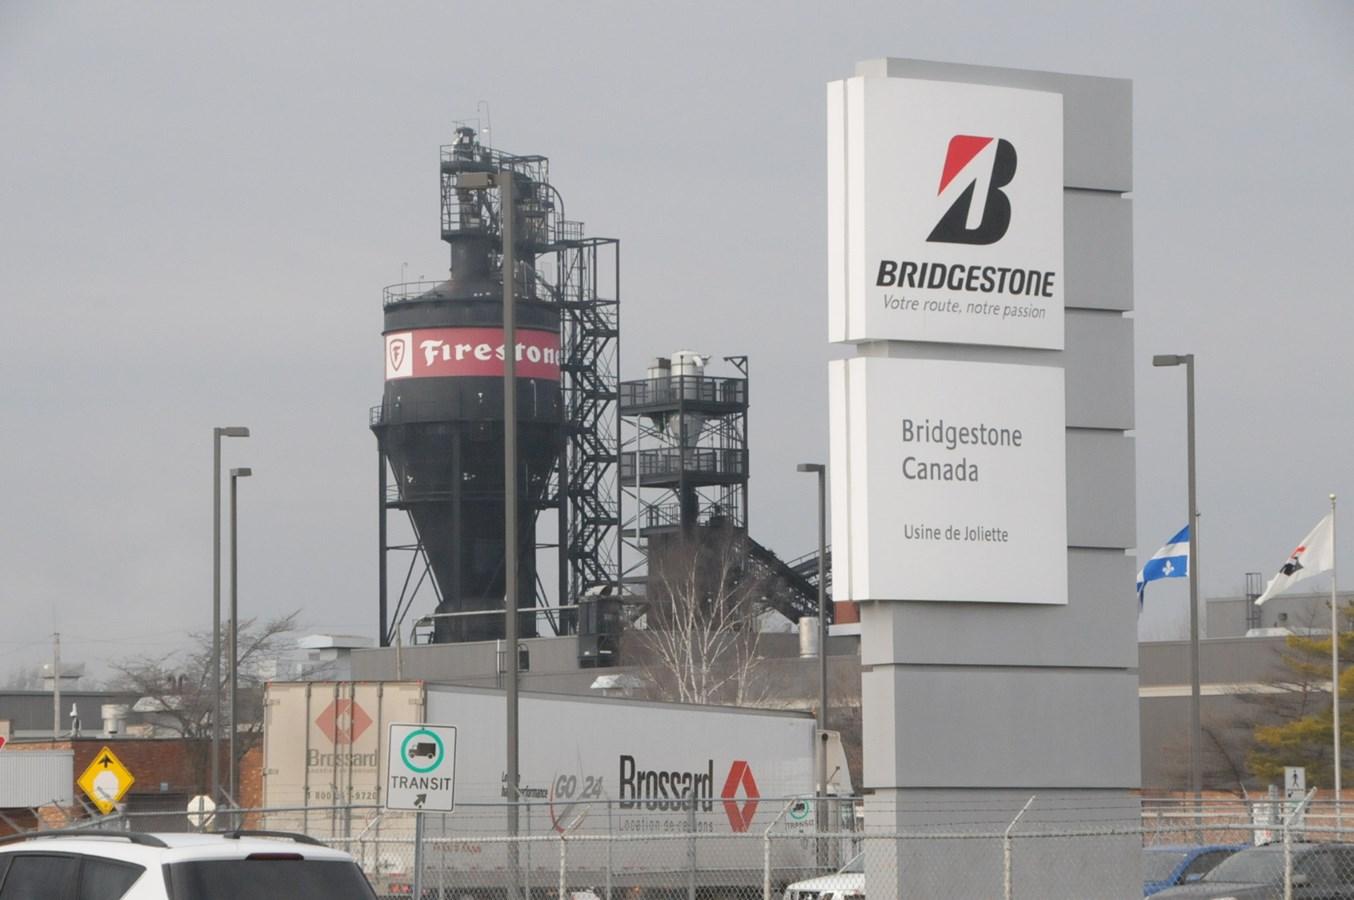 Bridgestone Lot 1 and 2 projects